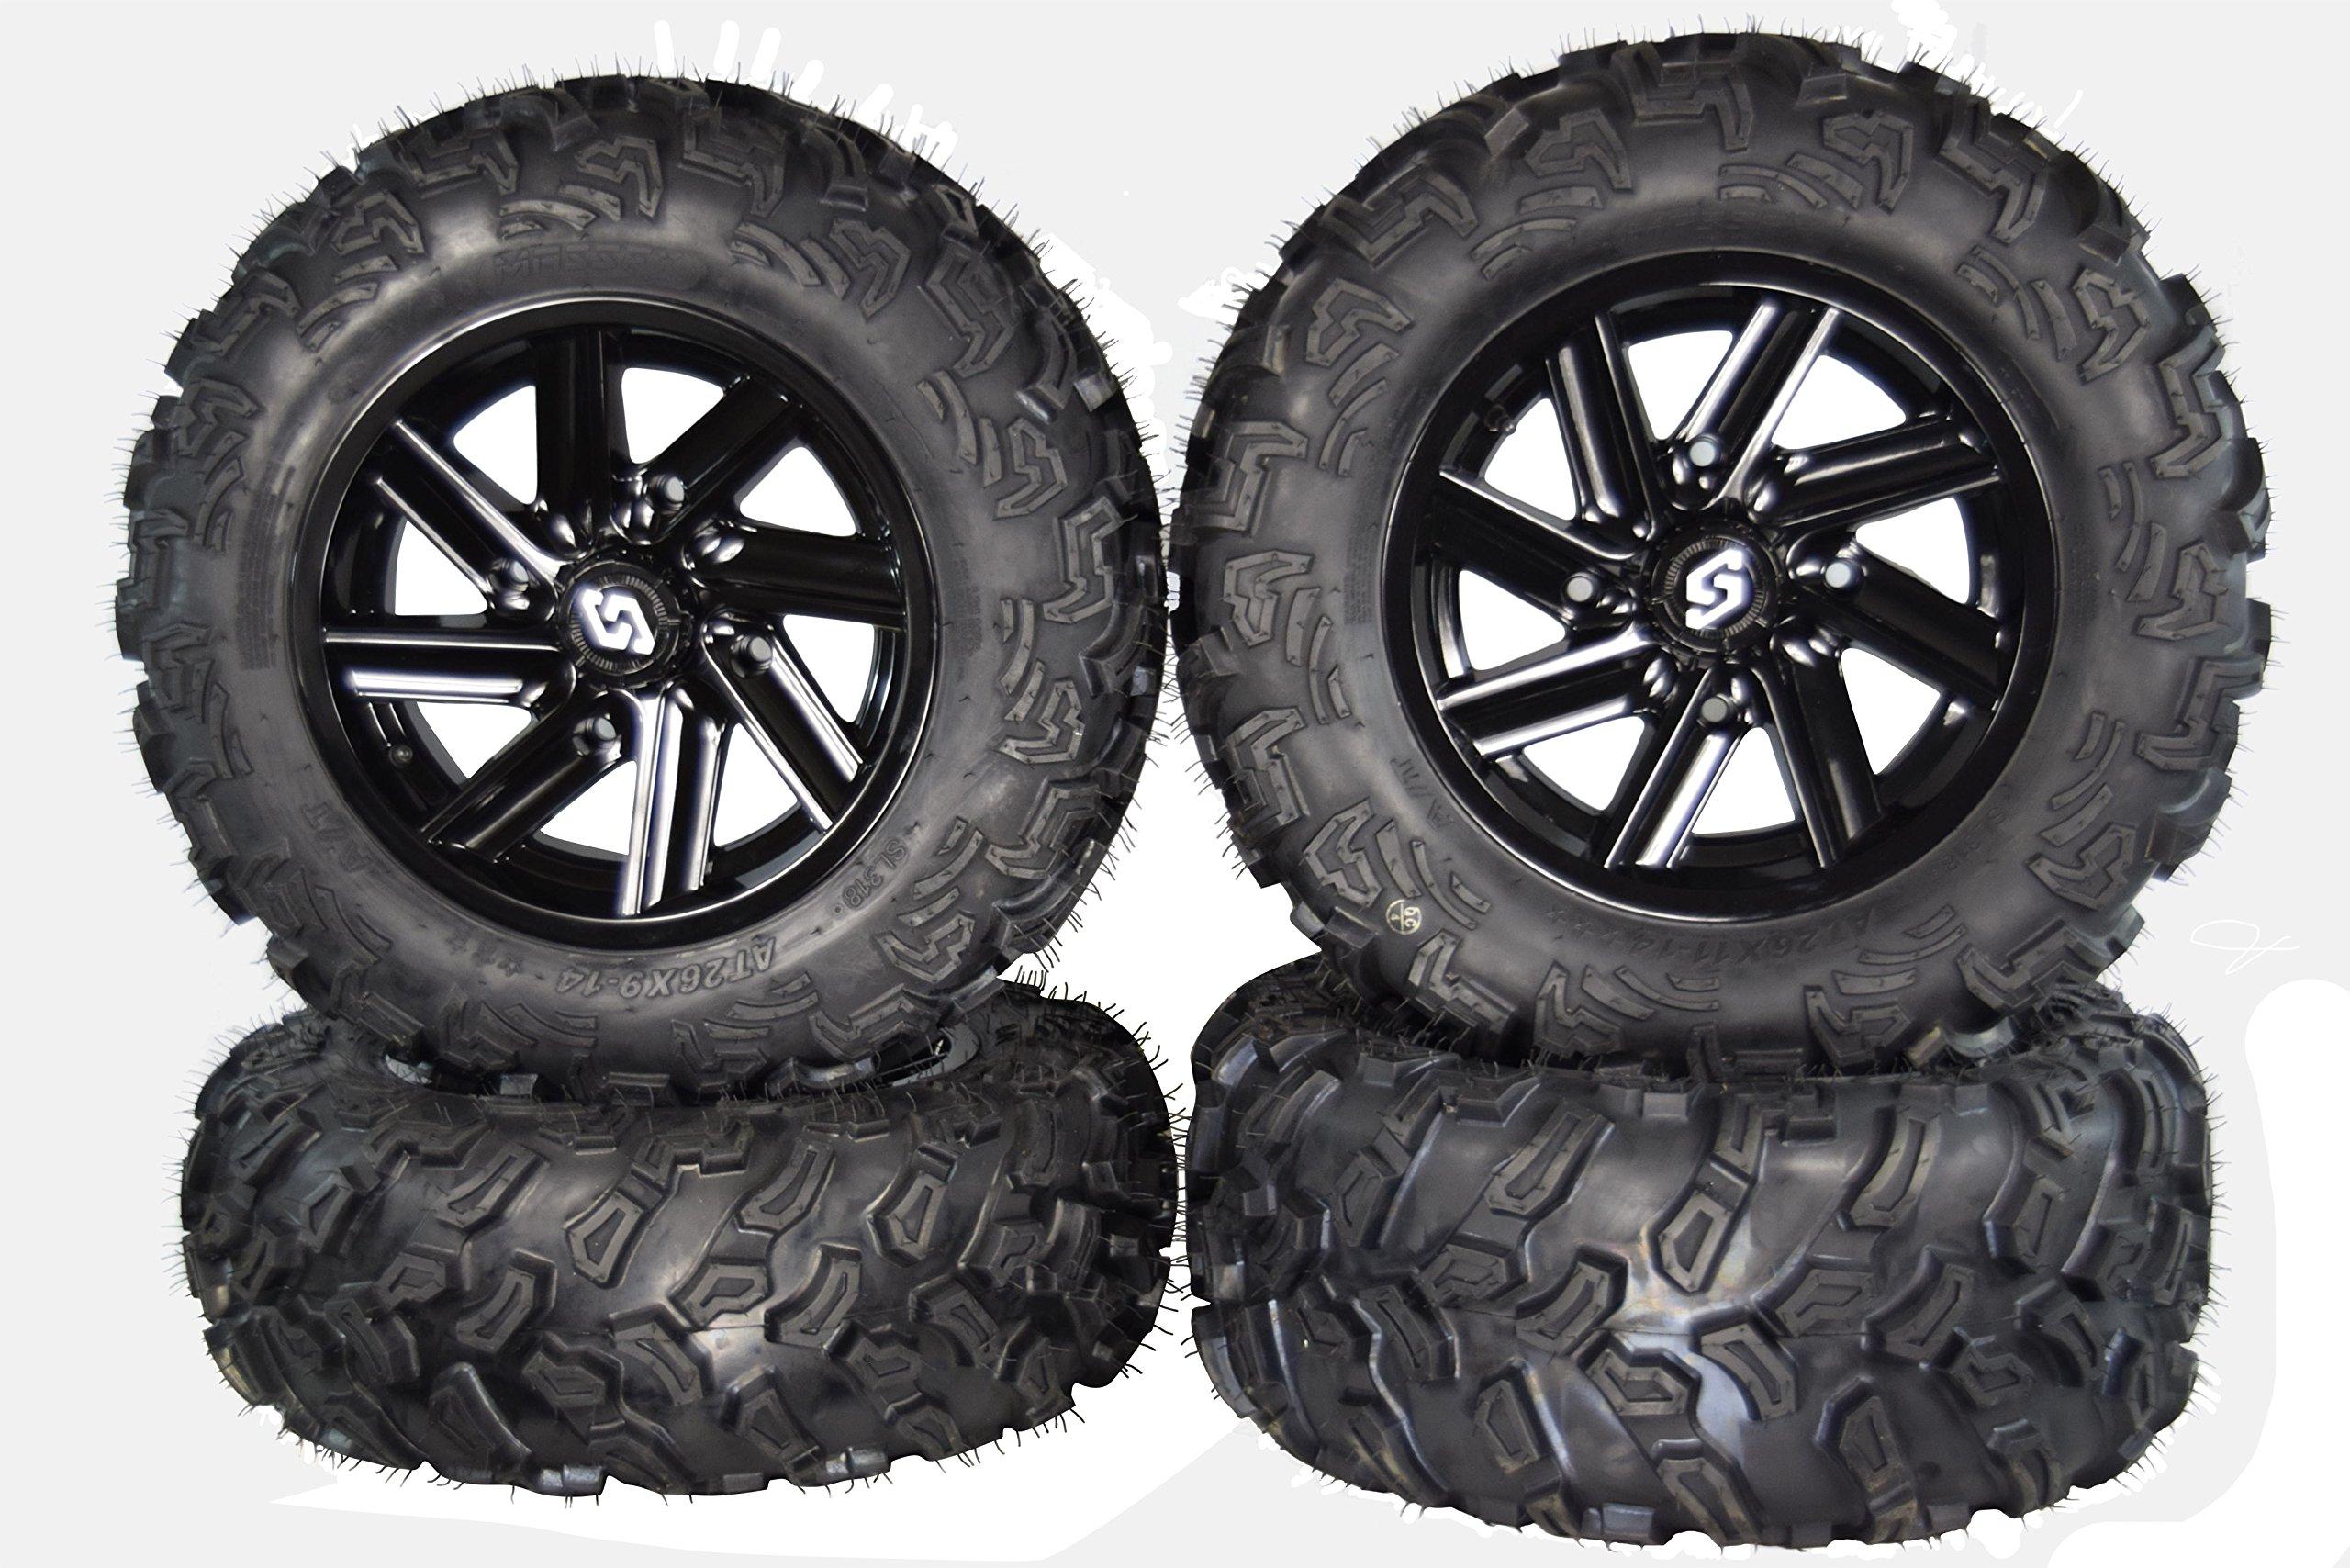 MASSFX SL 26'' Tall Wheel and Tire Kit for Polaris Sportsman W/ Sedona Chopper Rim